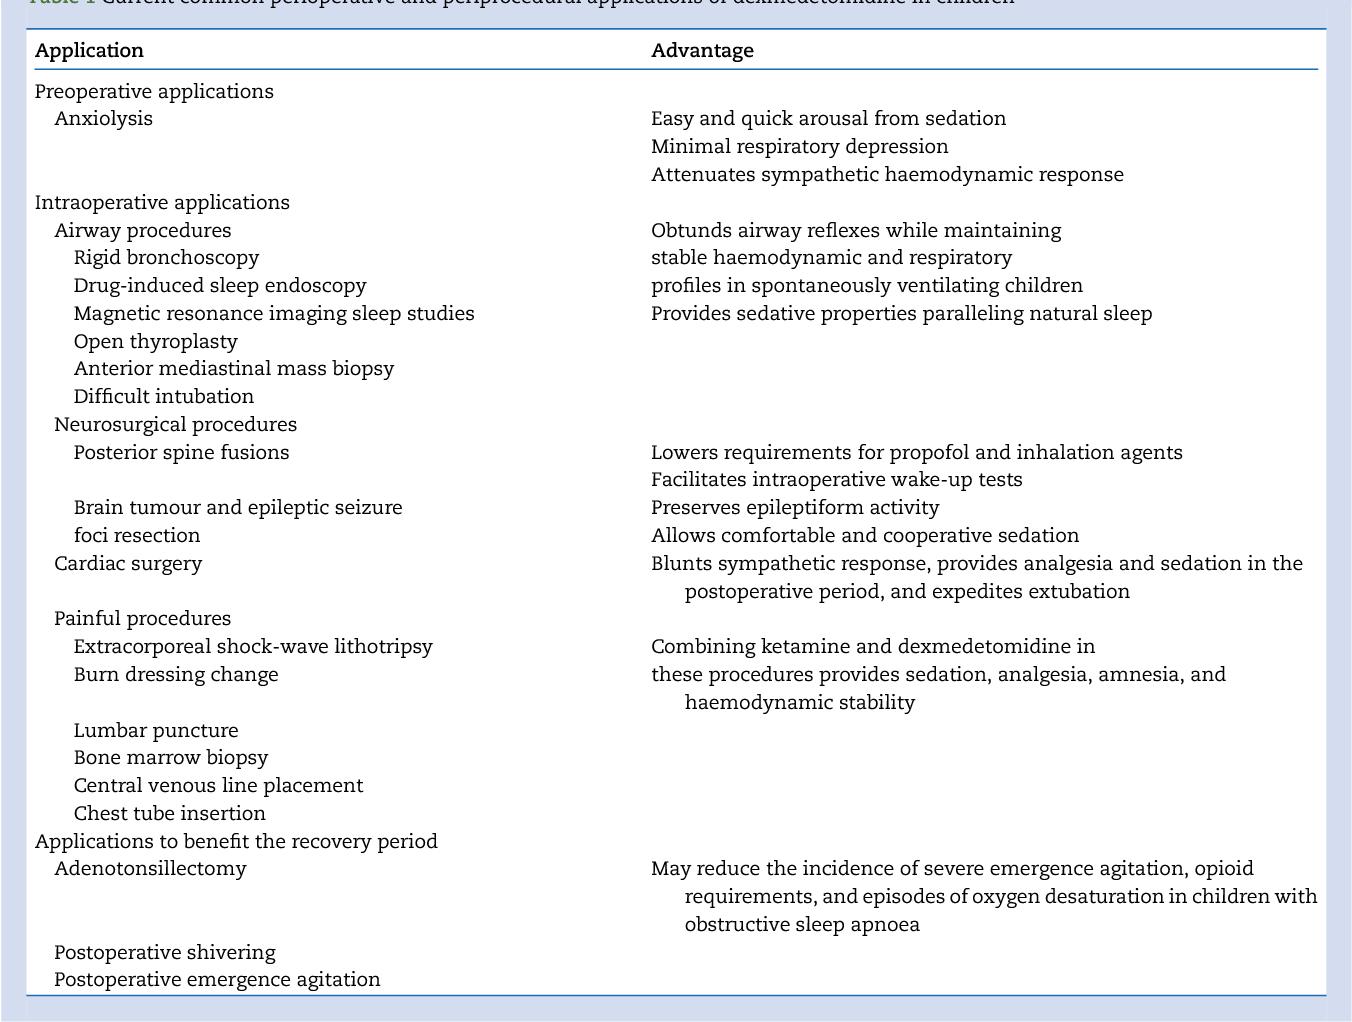 PDF] Dexmedetomidine: review, update, and future